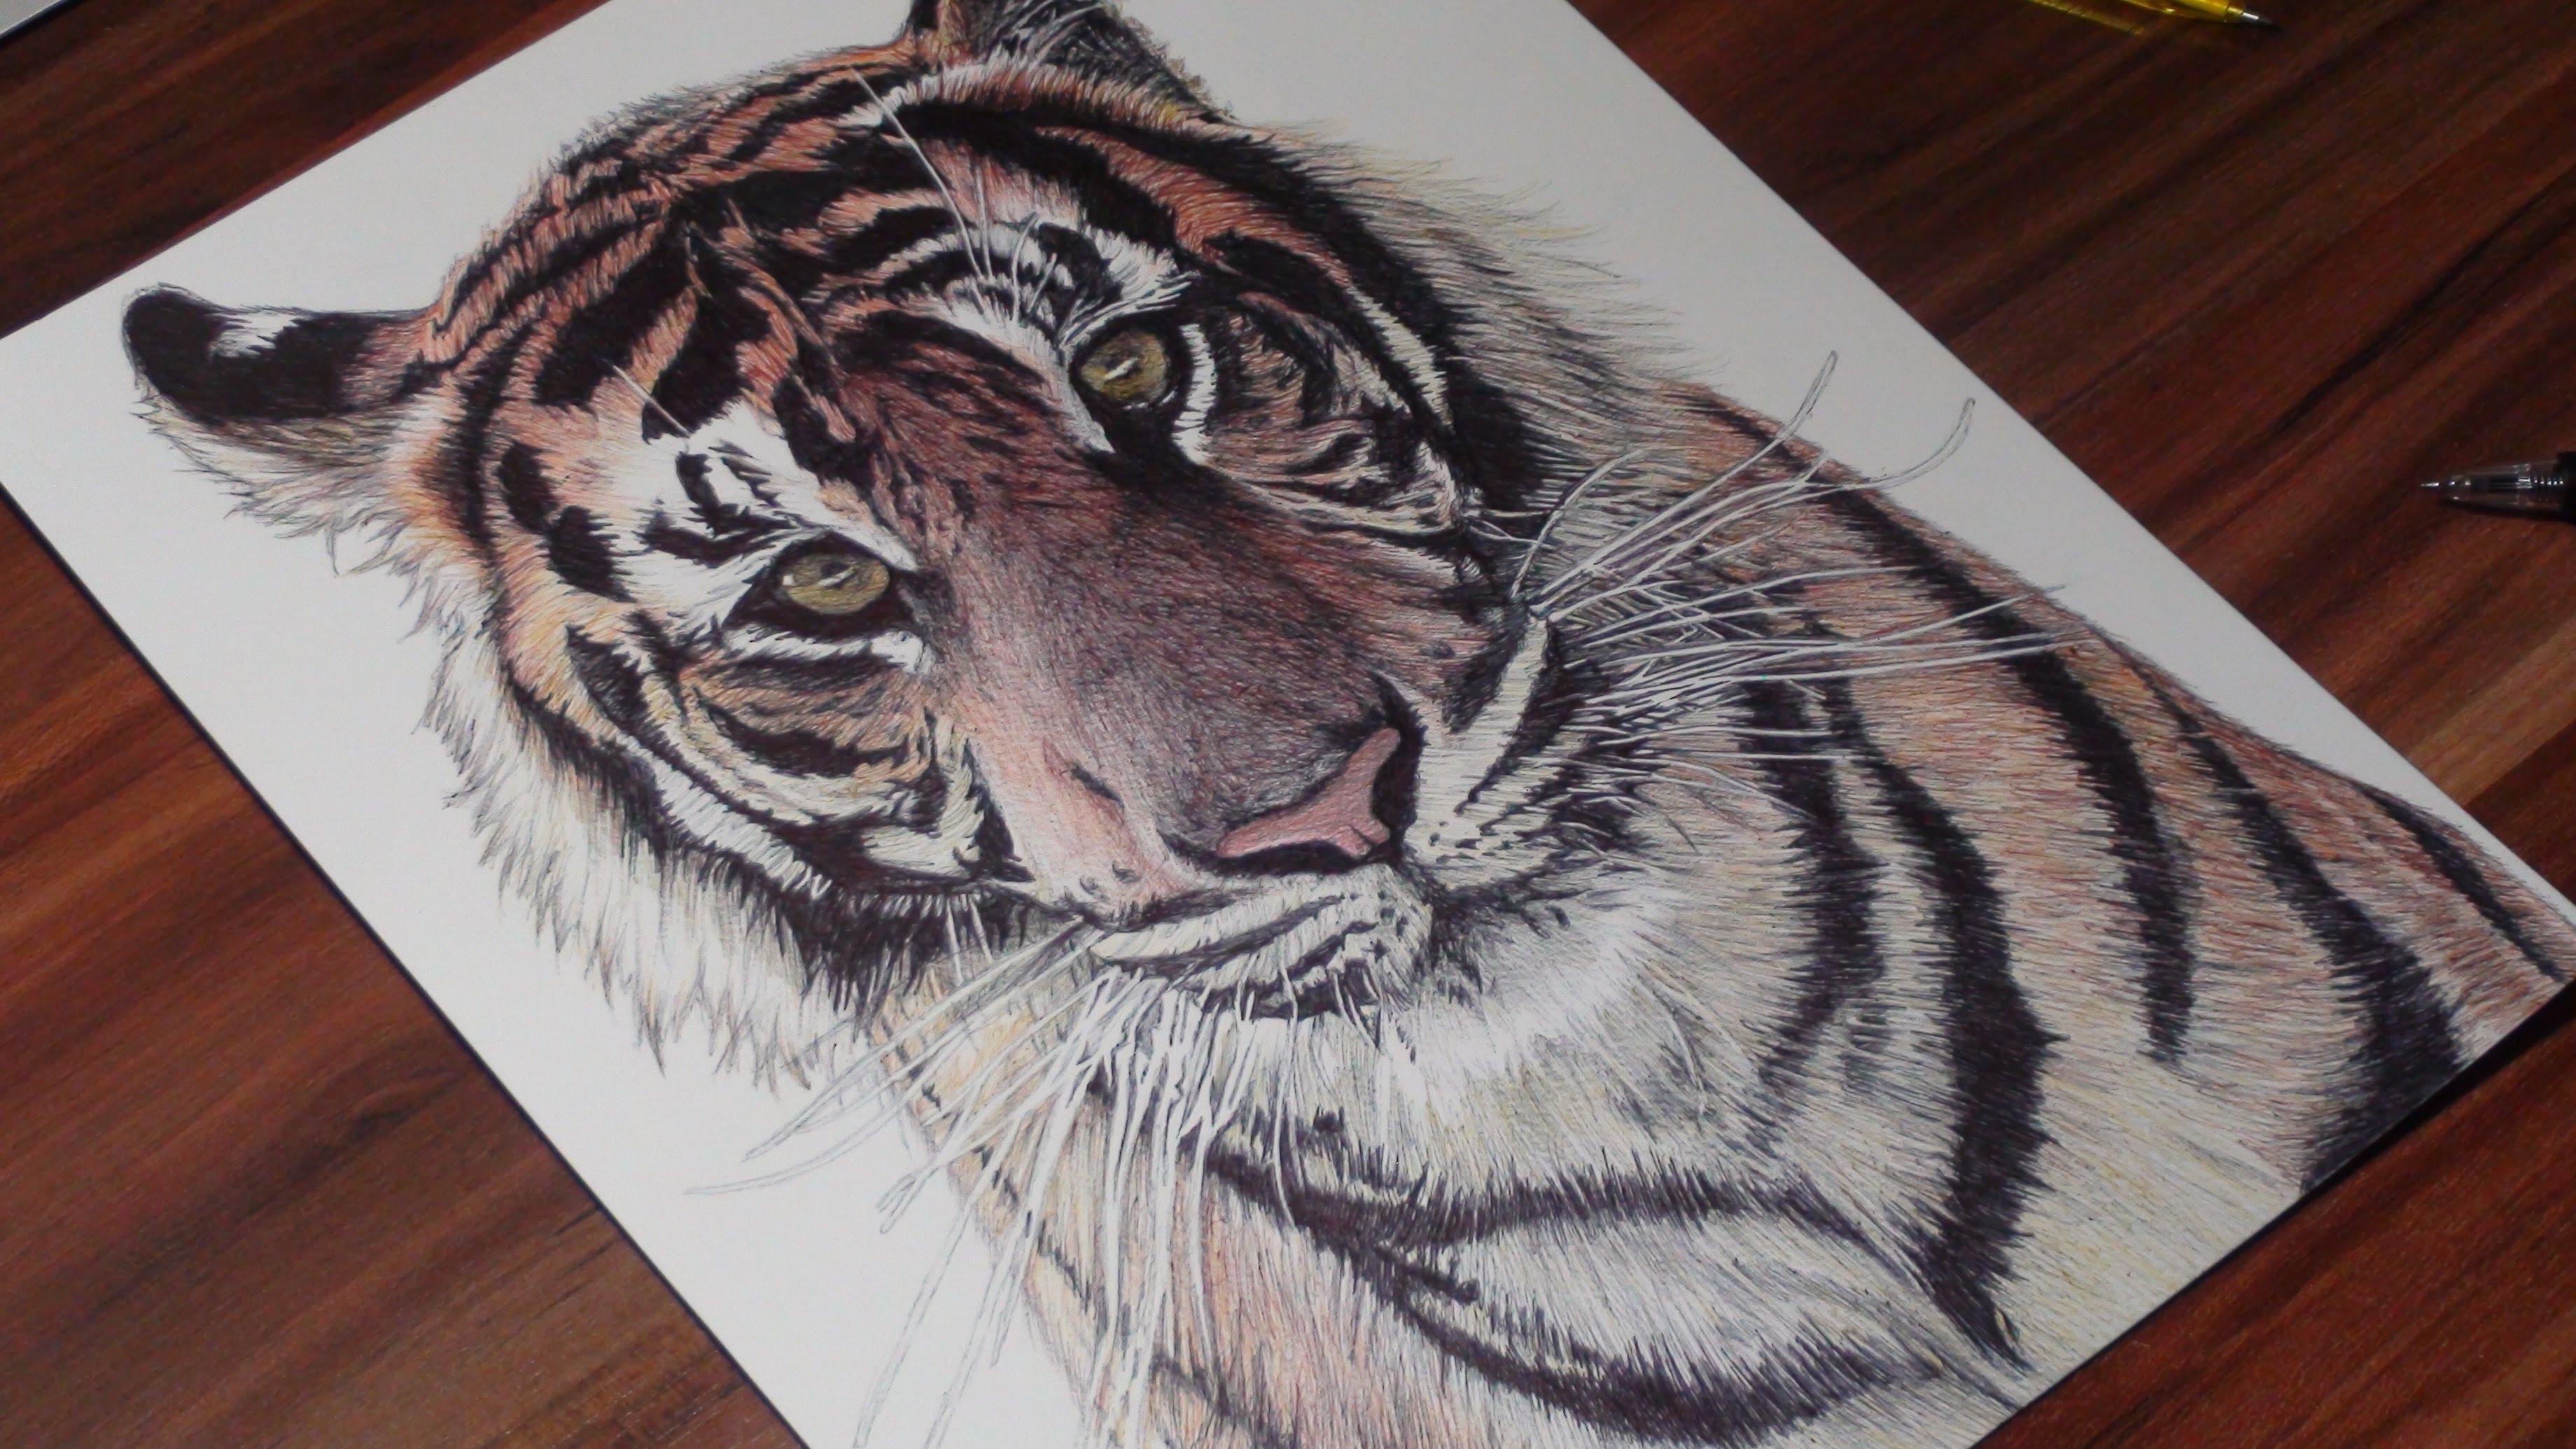 Drawn pen tiger Pen Art YouTube  DeMoose